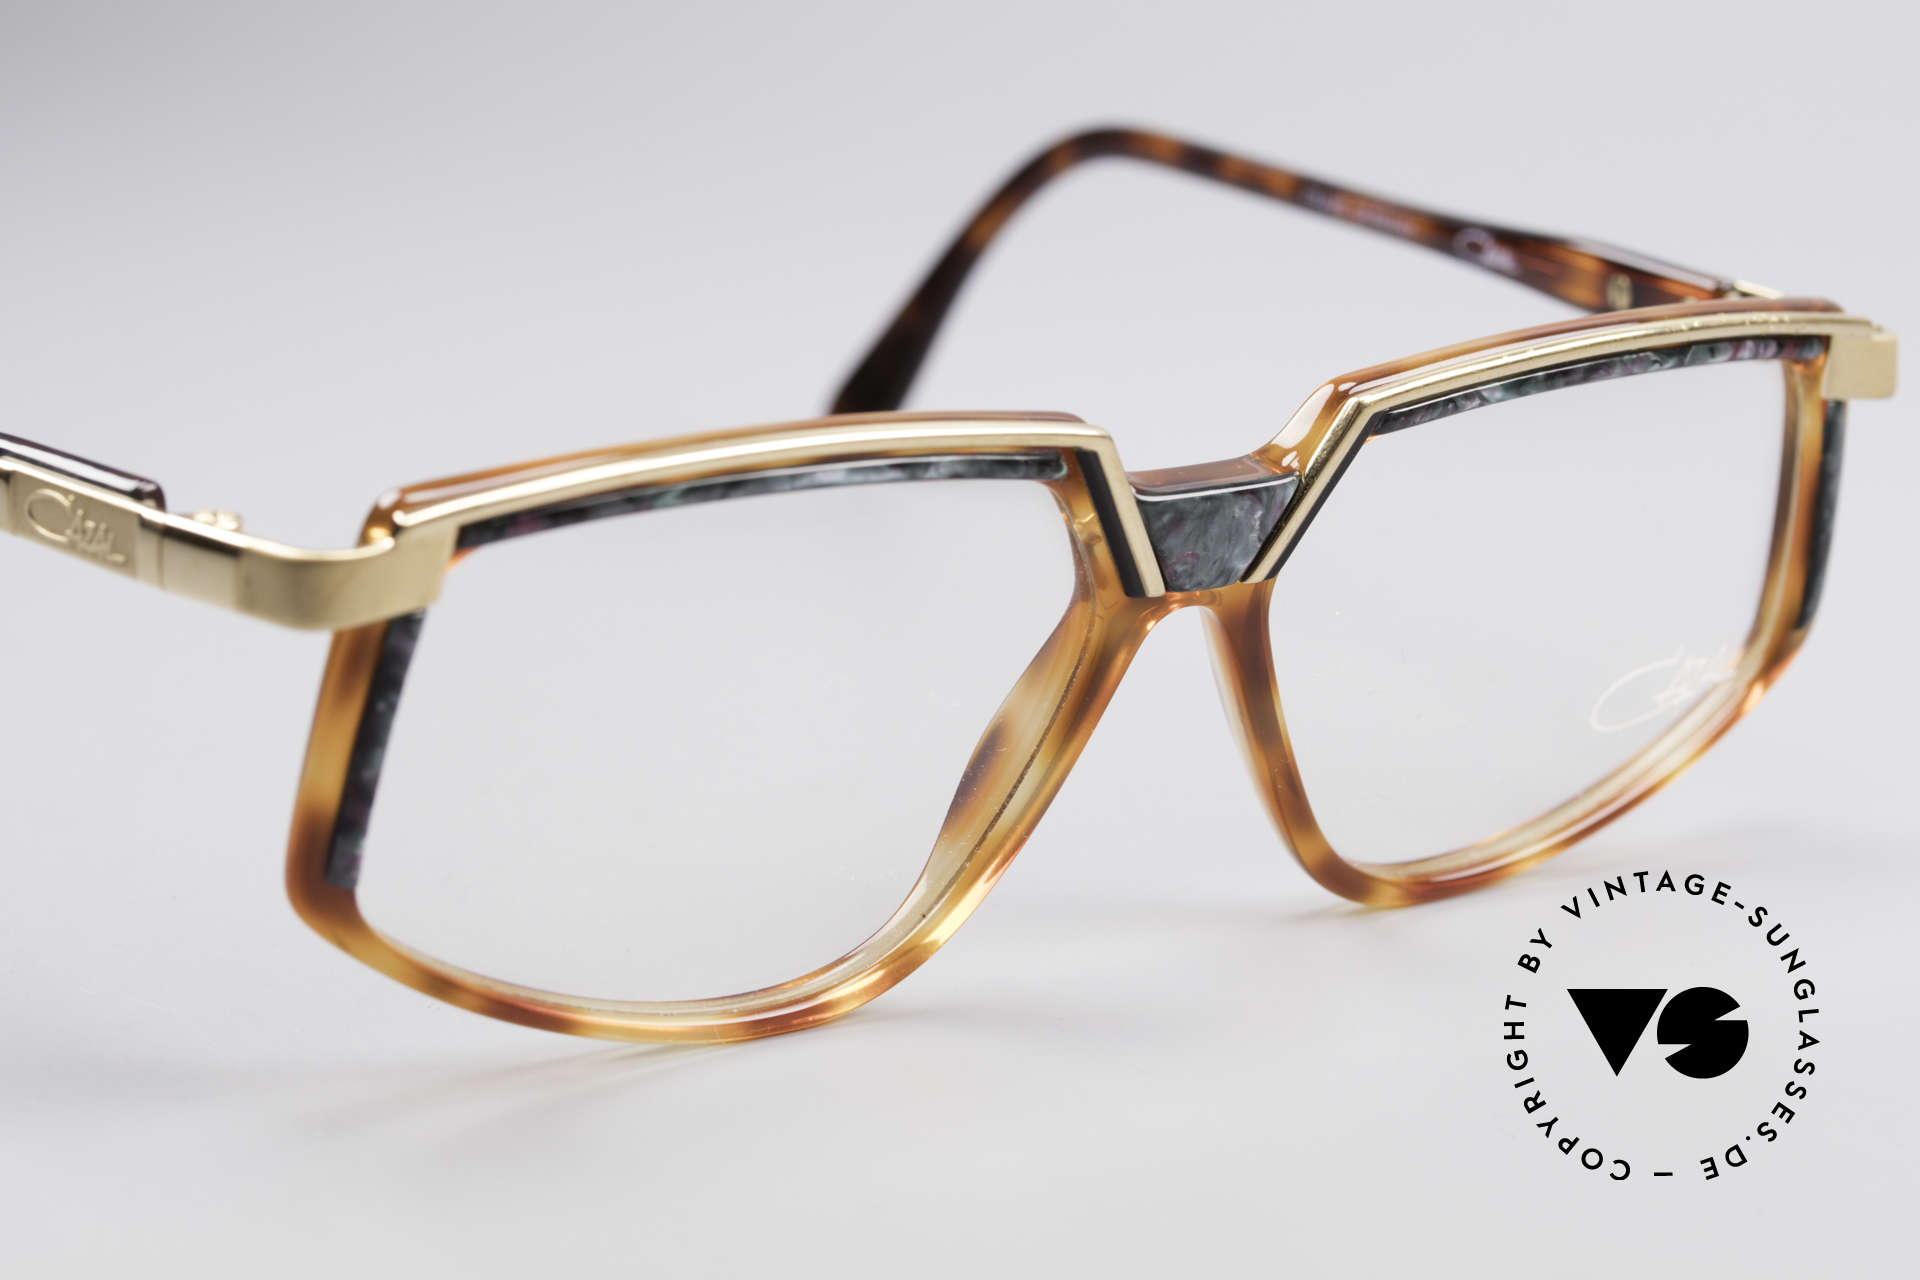 Cazal 337 Vintage Frame No Retro Cazal, unworn, NOS (like all our rare vintage Cazal eyewear), Made for Men and Women